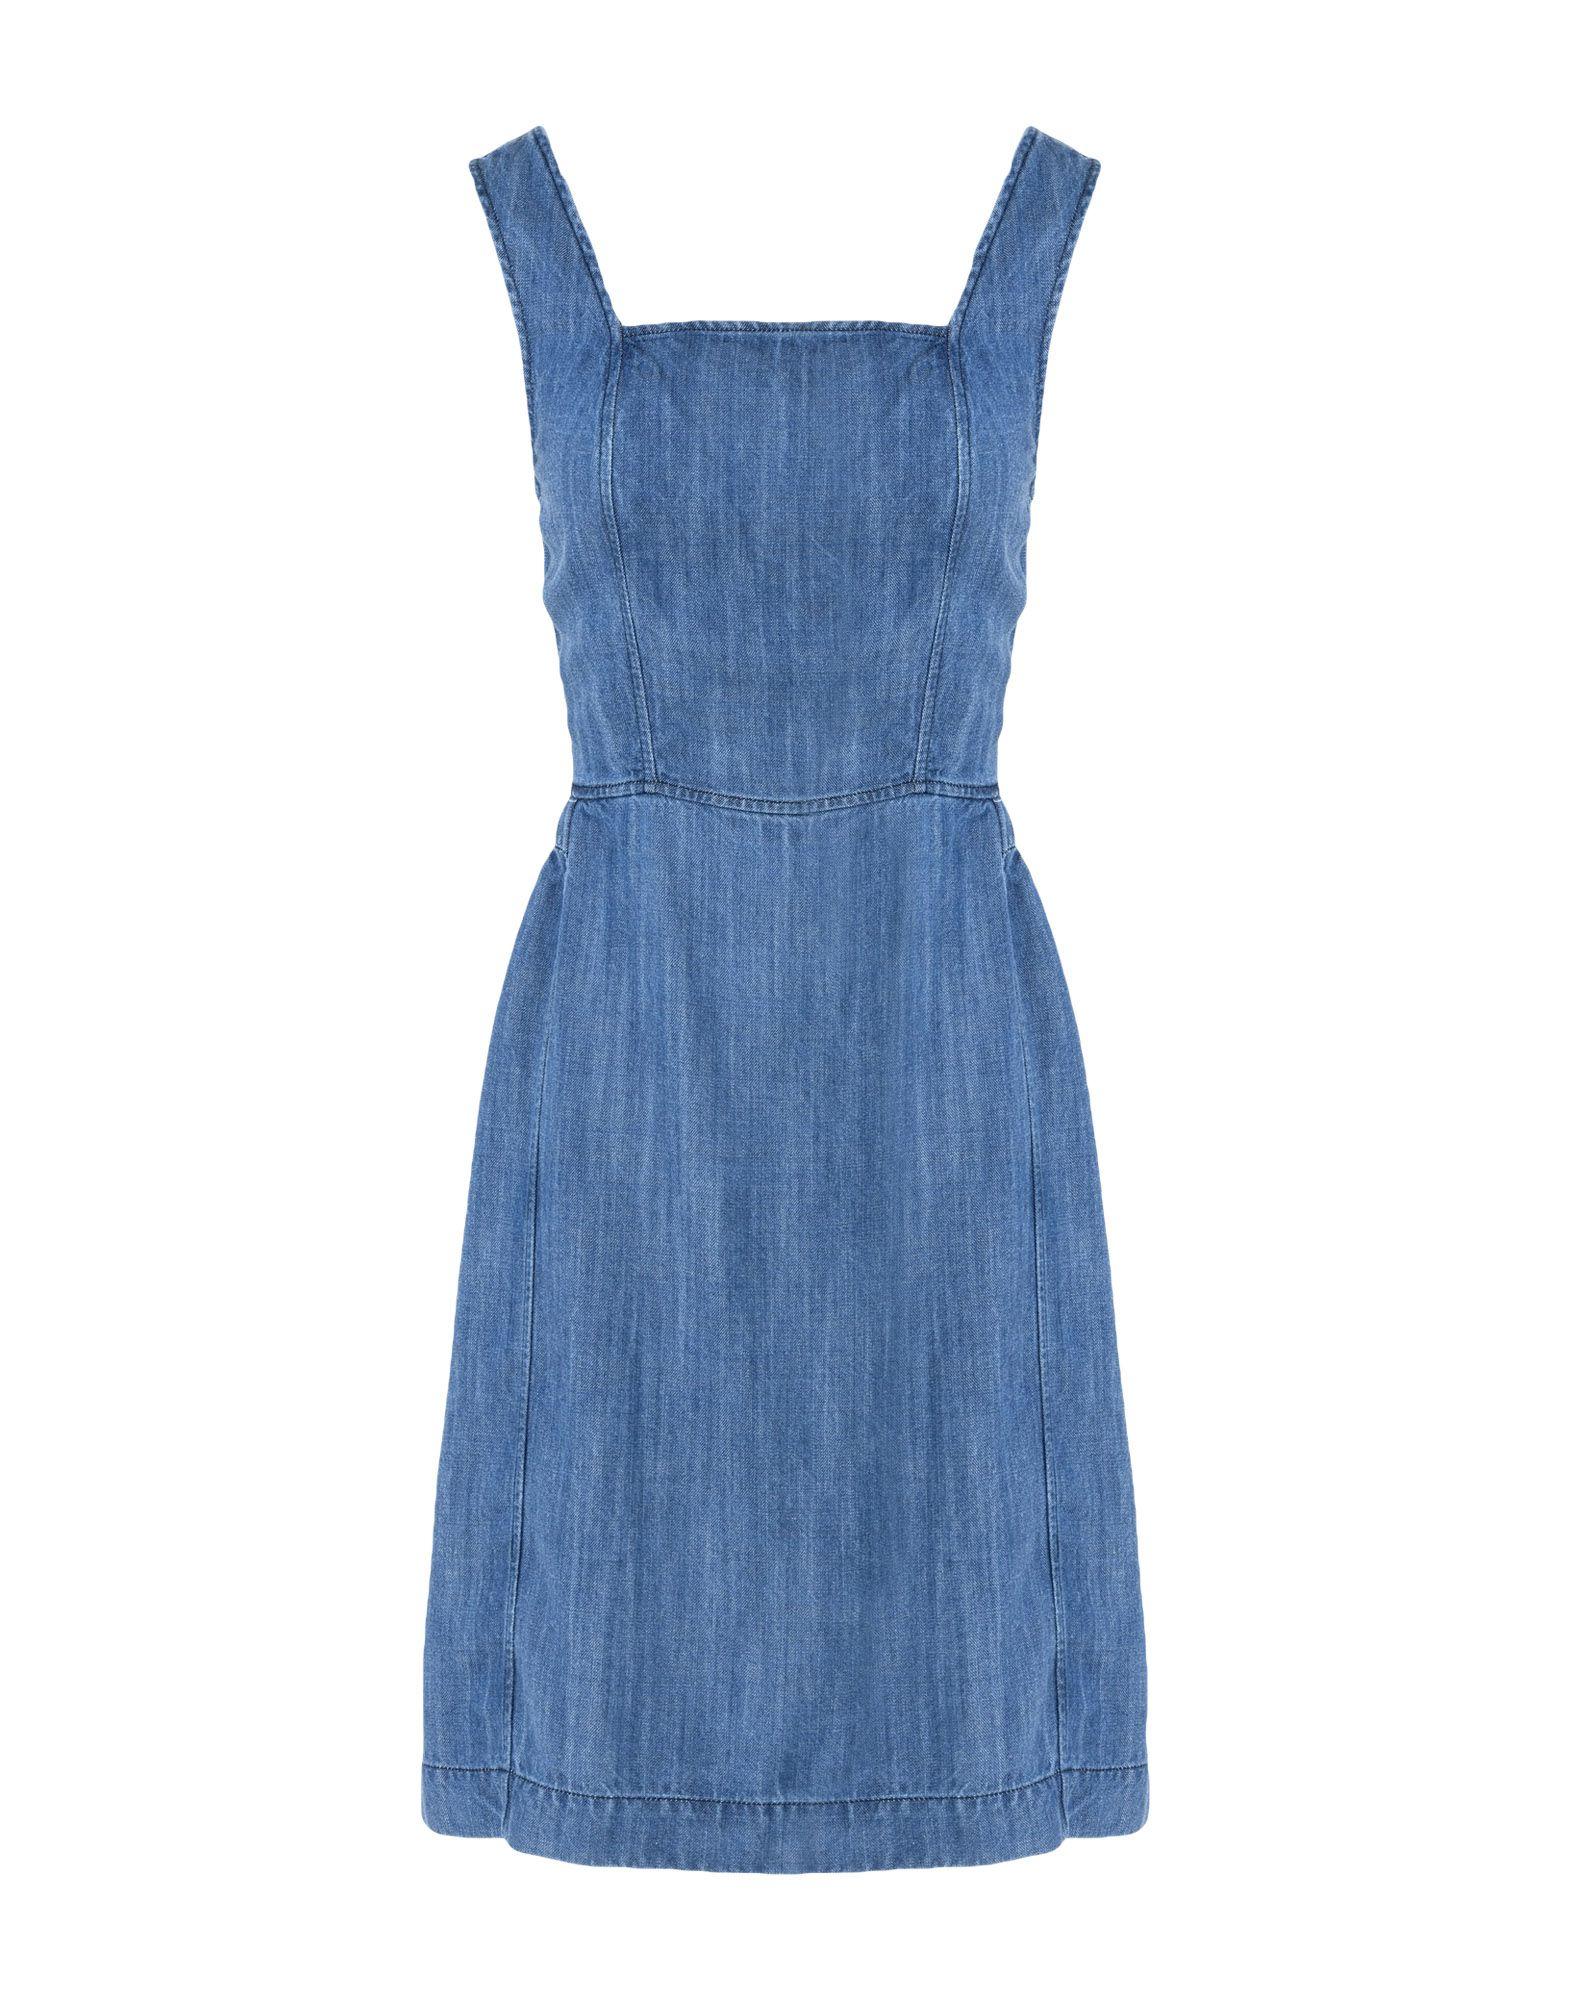 8 Короткое платье resho короткое платье